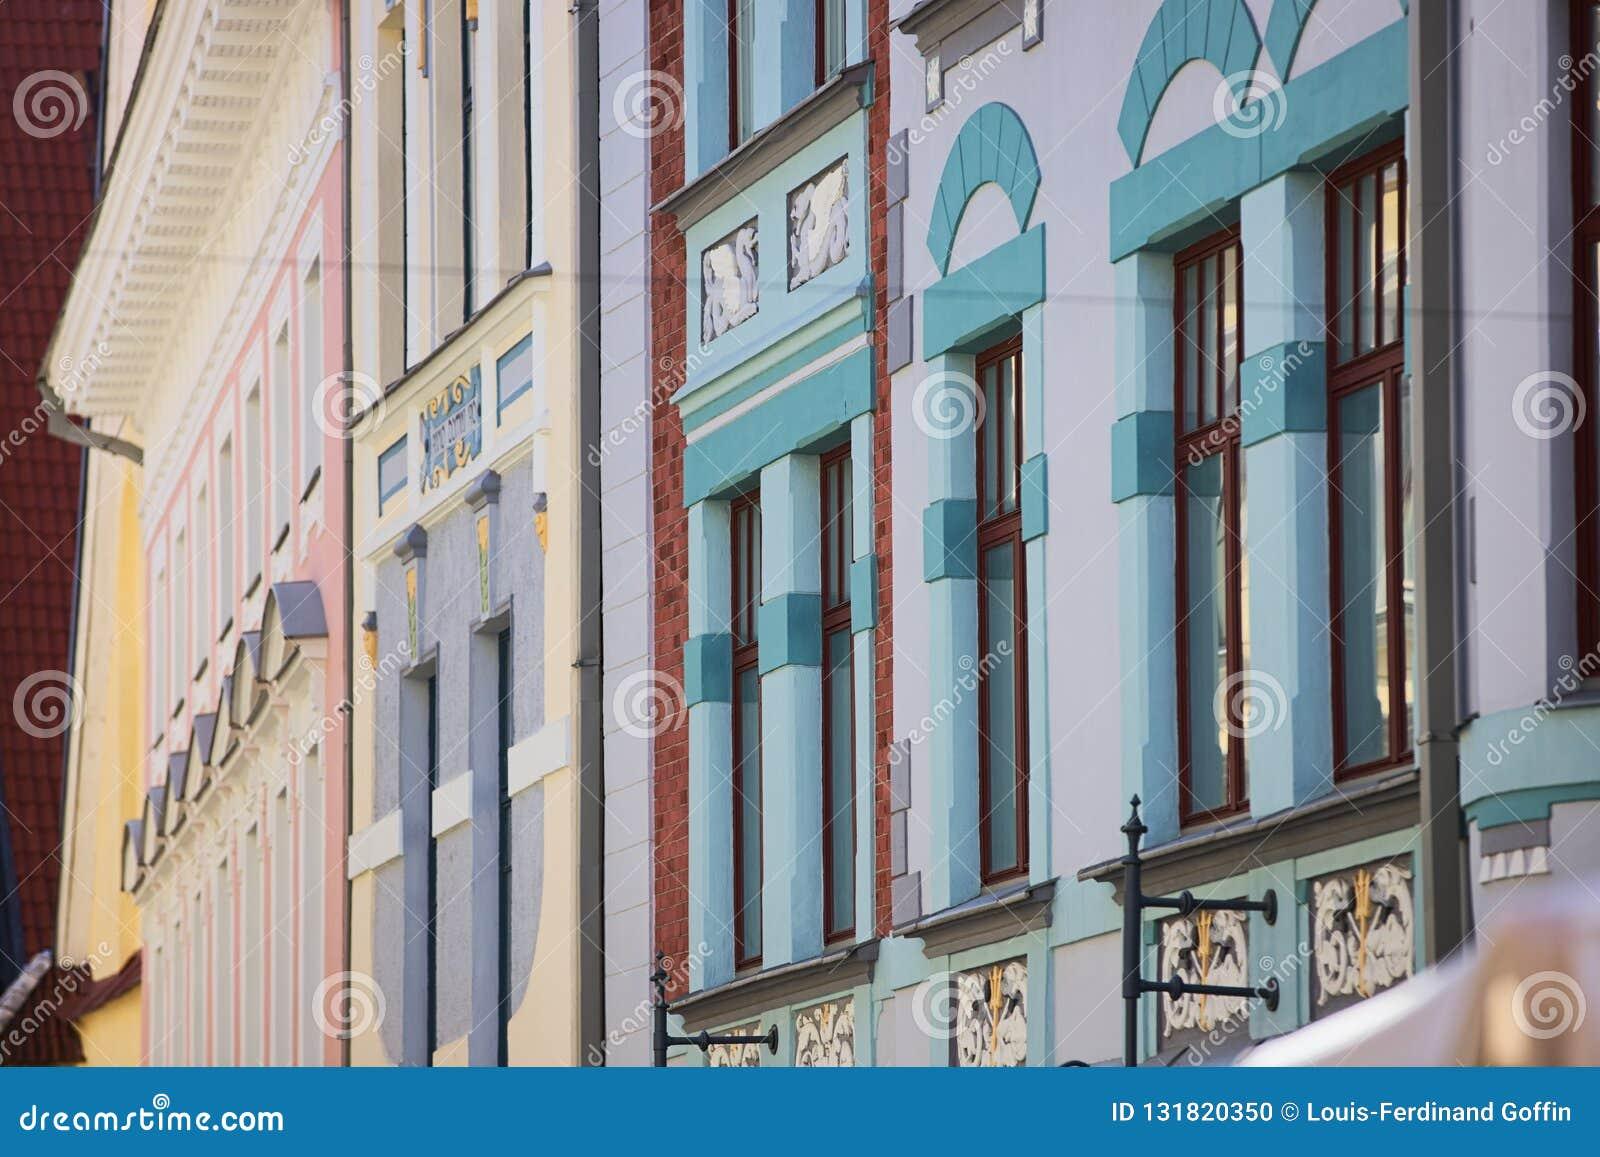 Bezaubernde KunstDeco-Fassaden in Tallinn, Estland